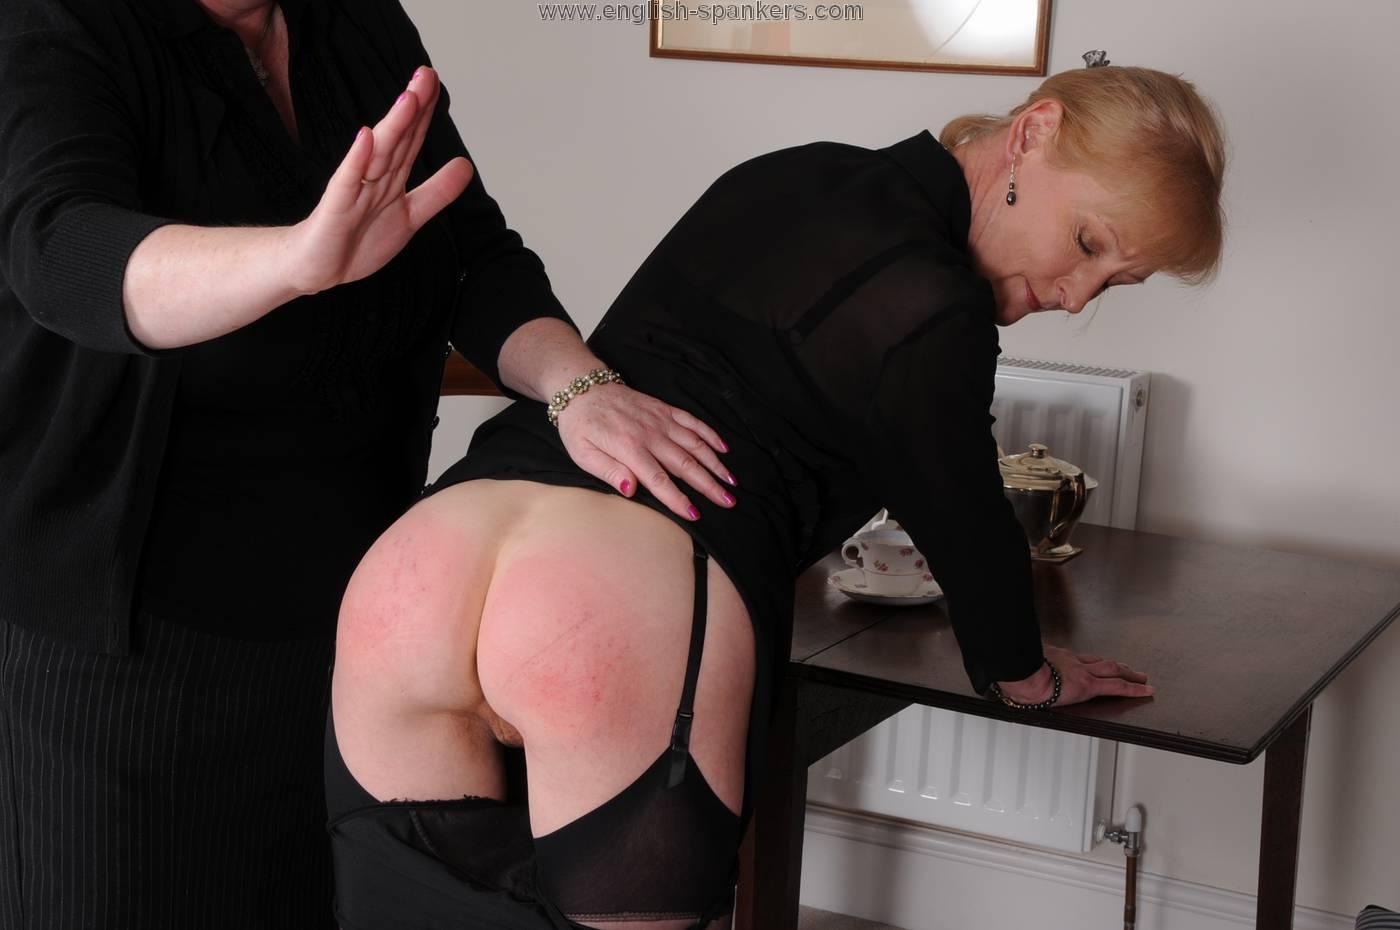 Suzie gets a spank